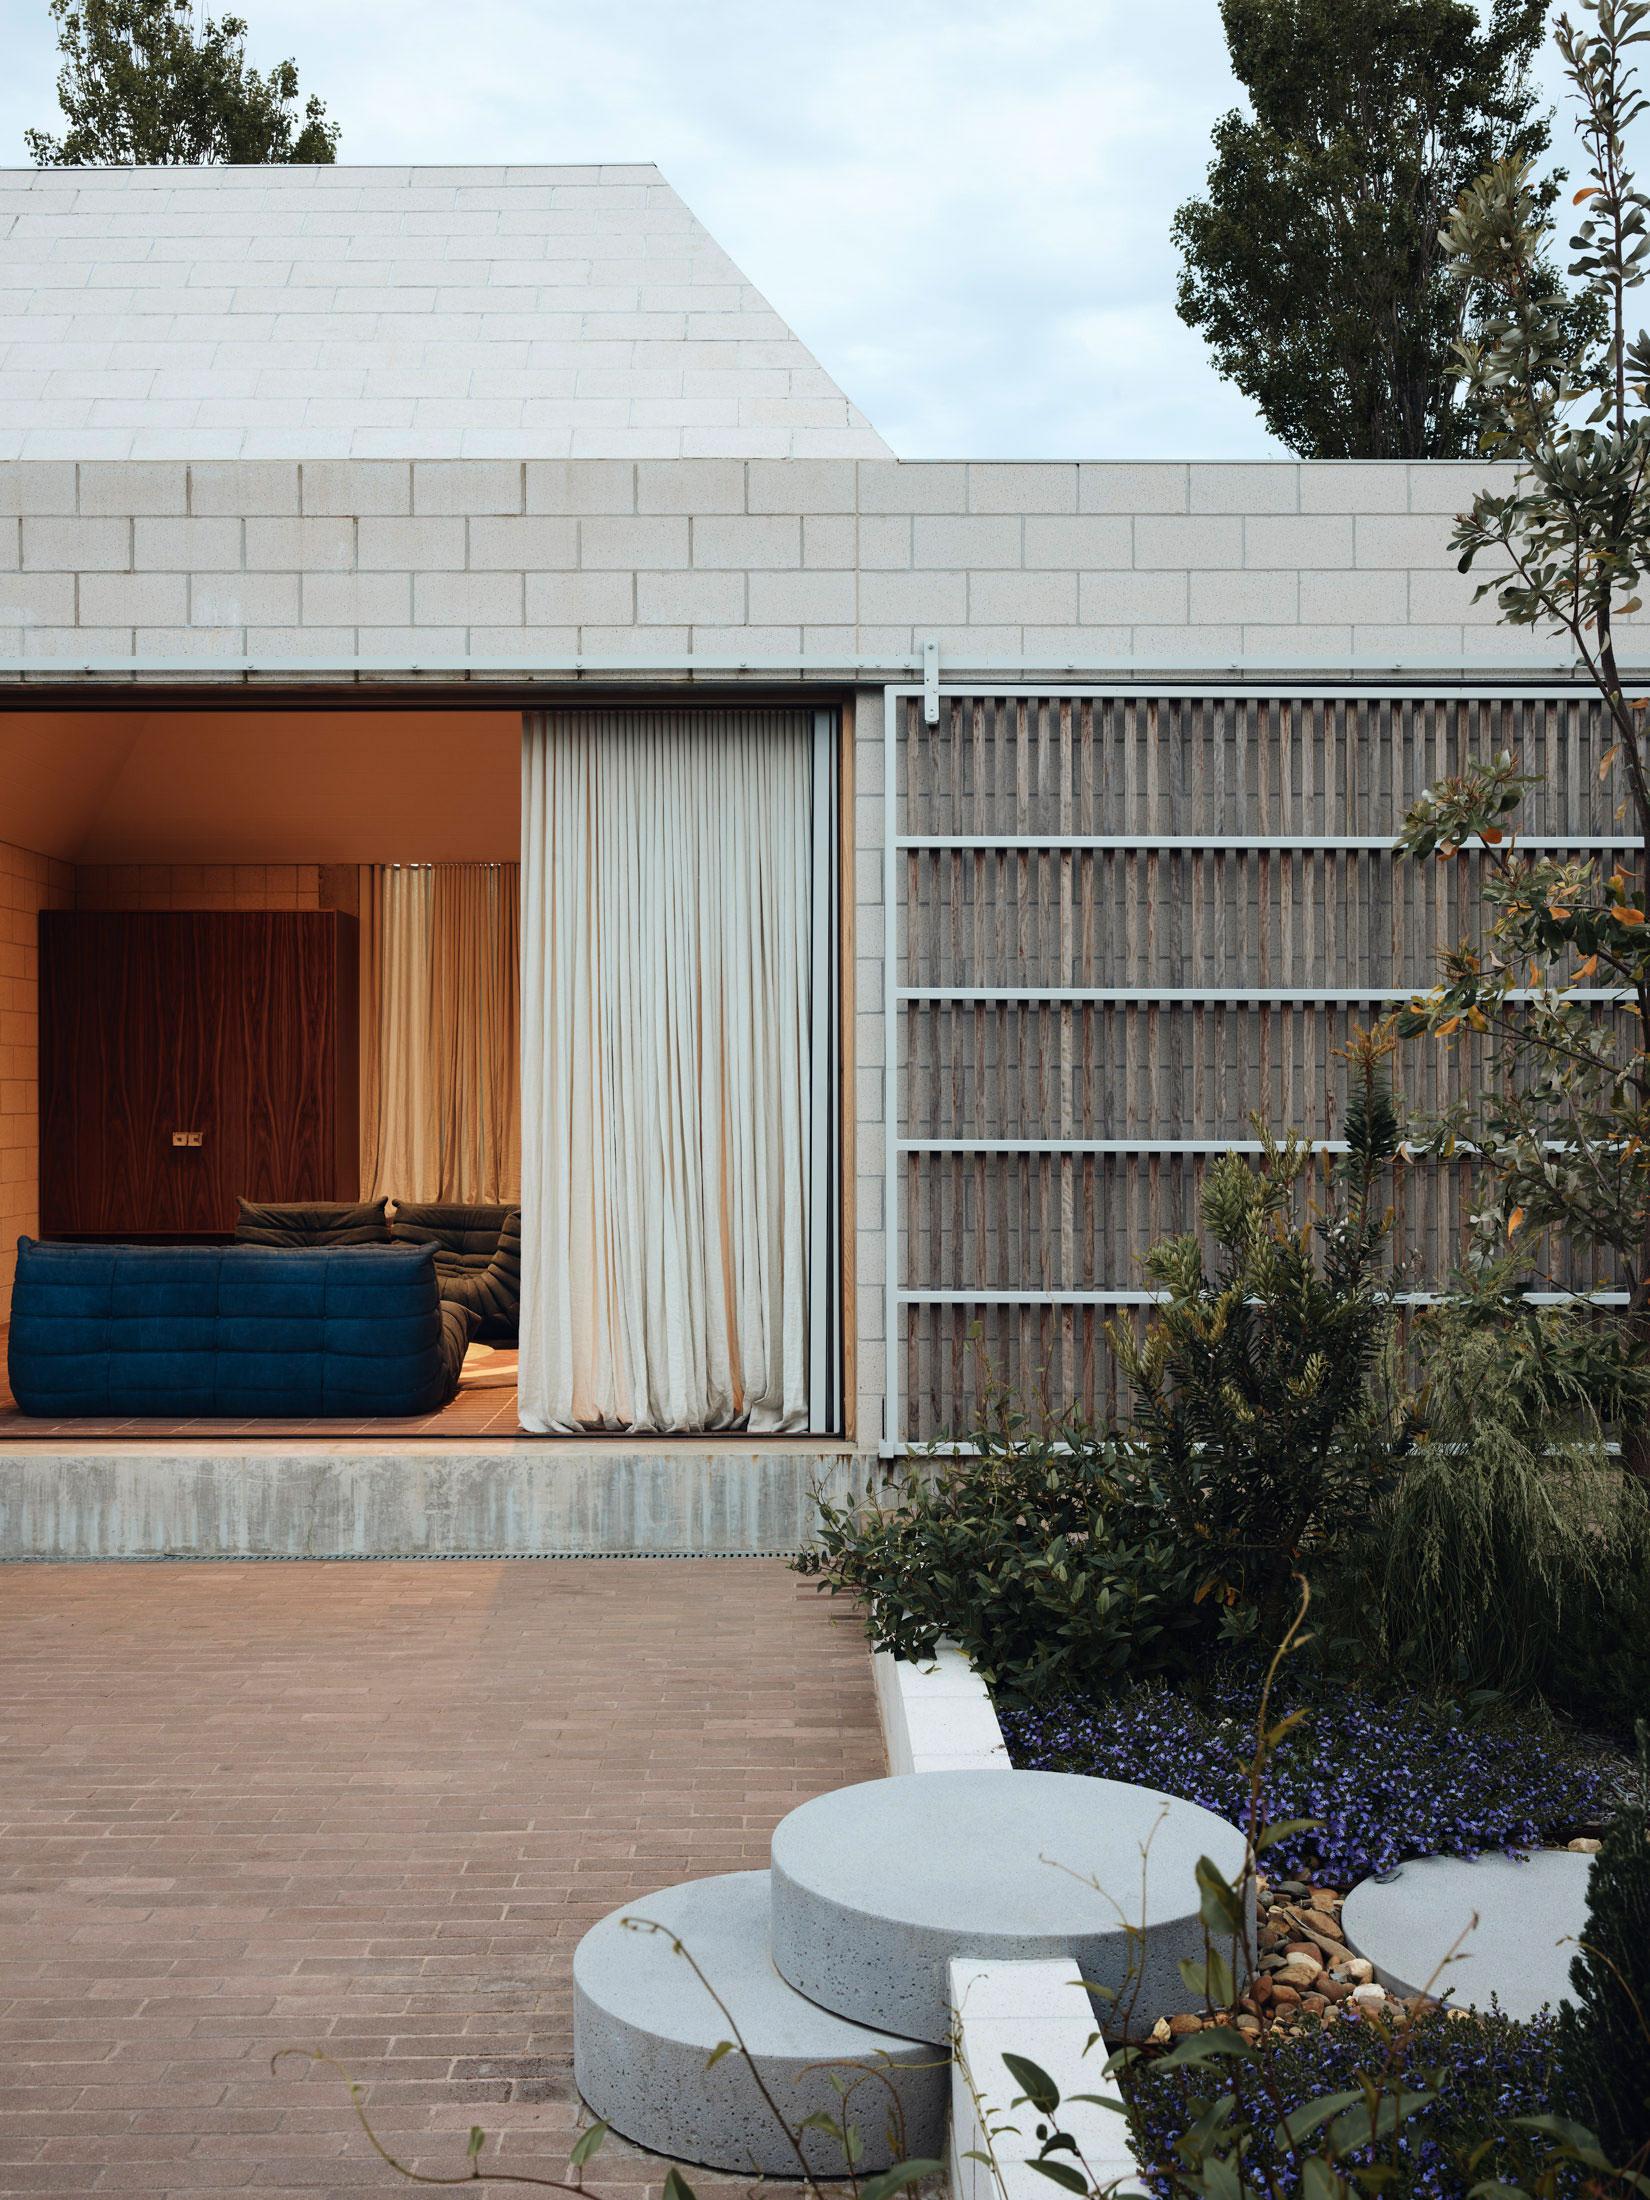 Architects Eat Bellows Beach House Flinders Masonry Architecture Photo Derek Swalwell Yellowtrace 59